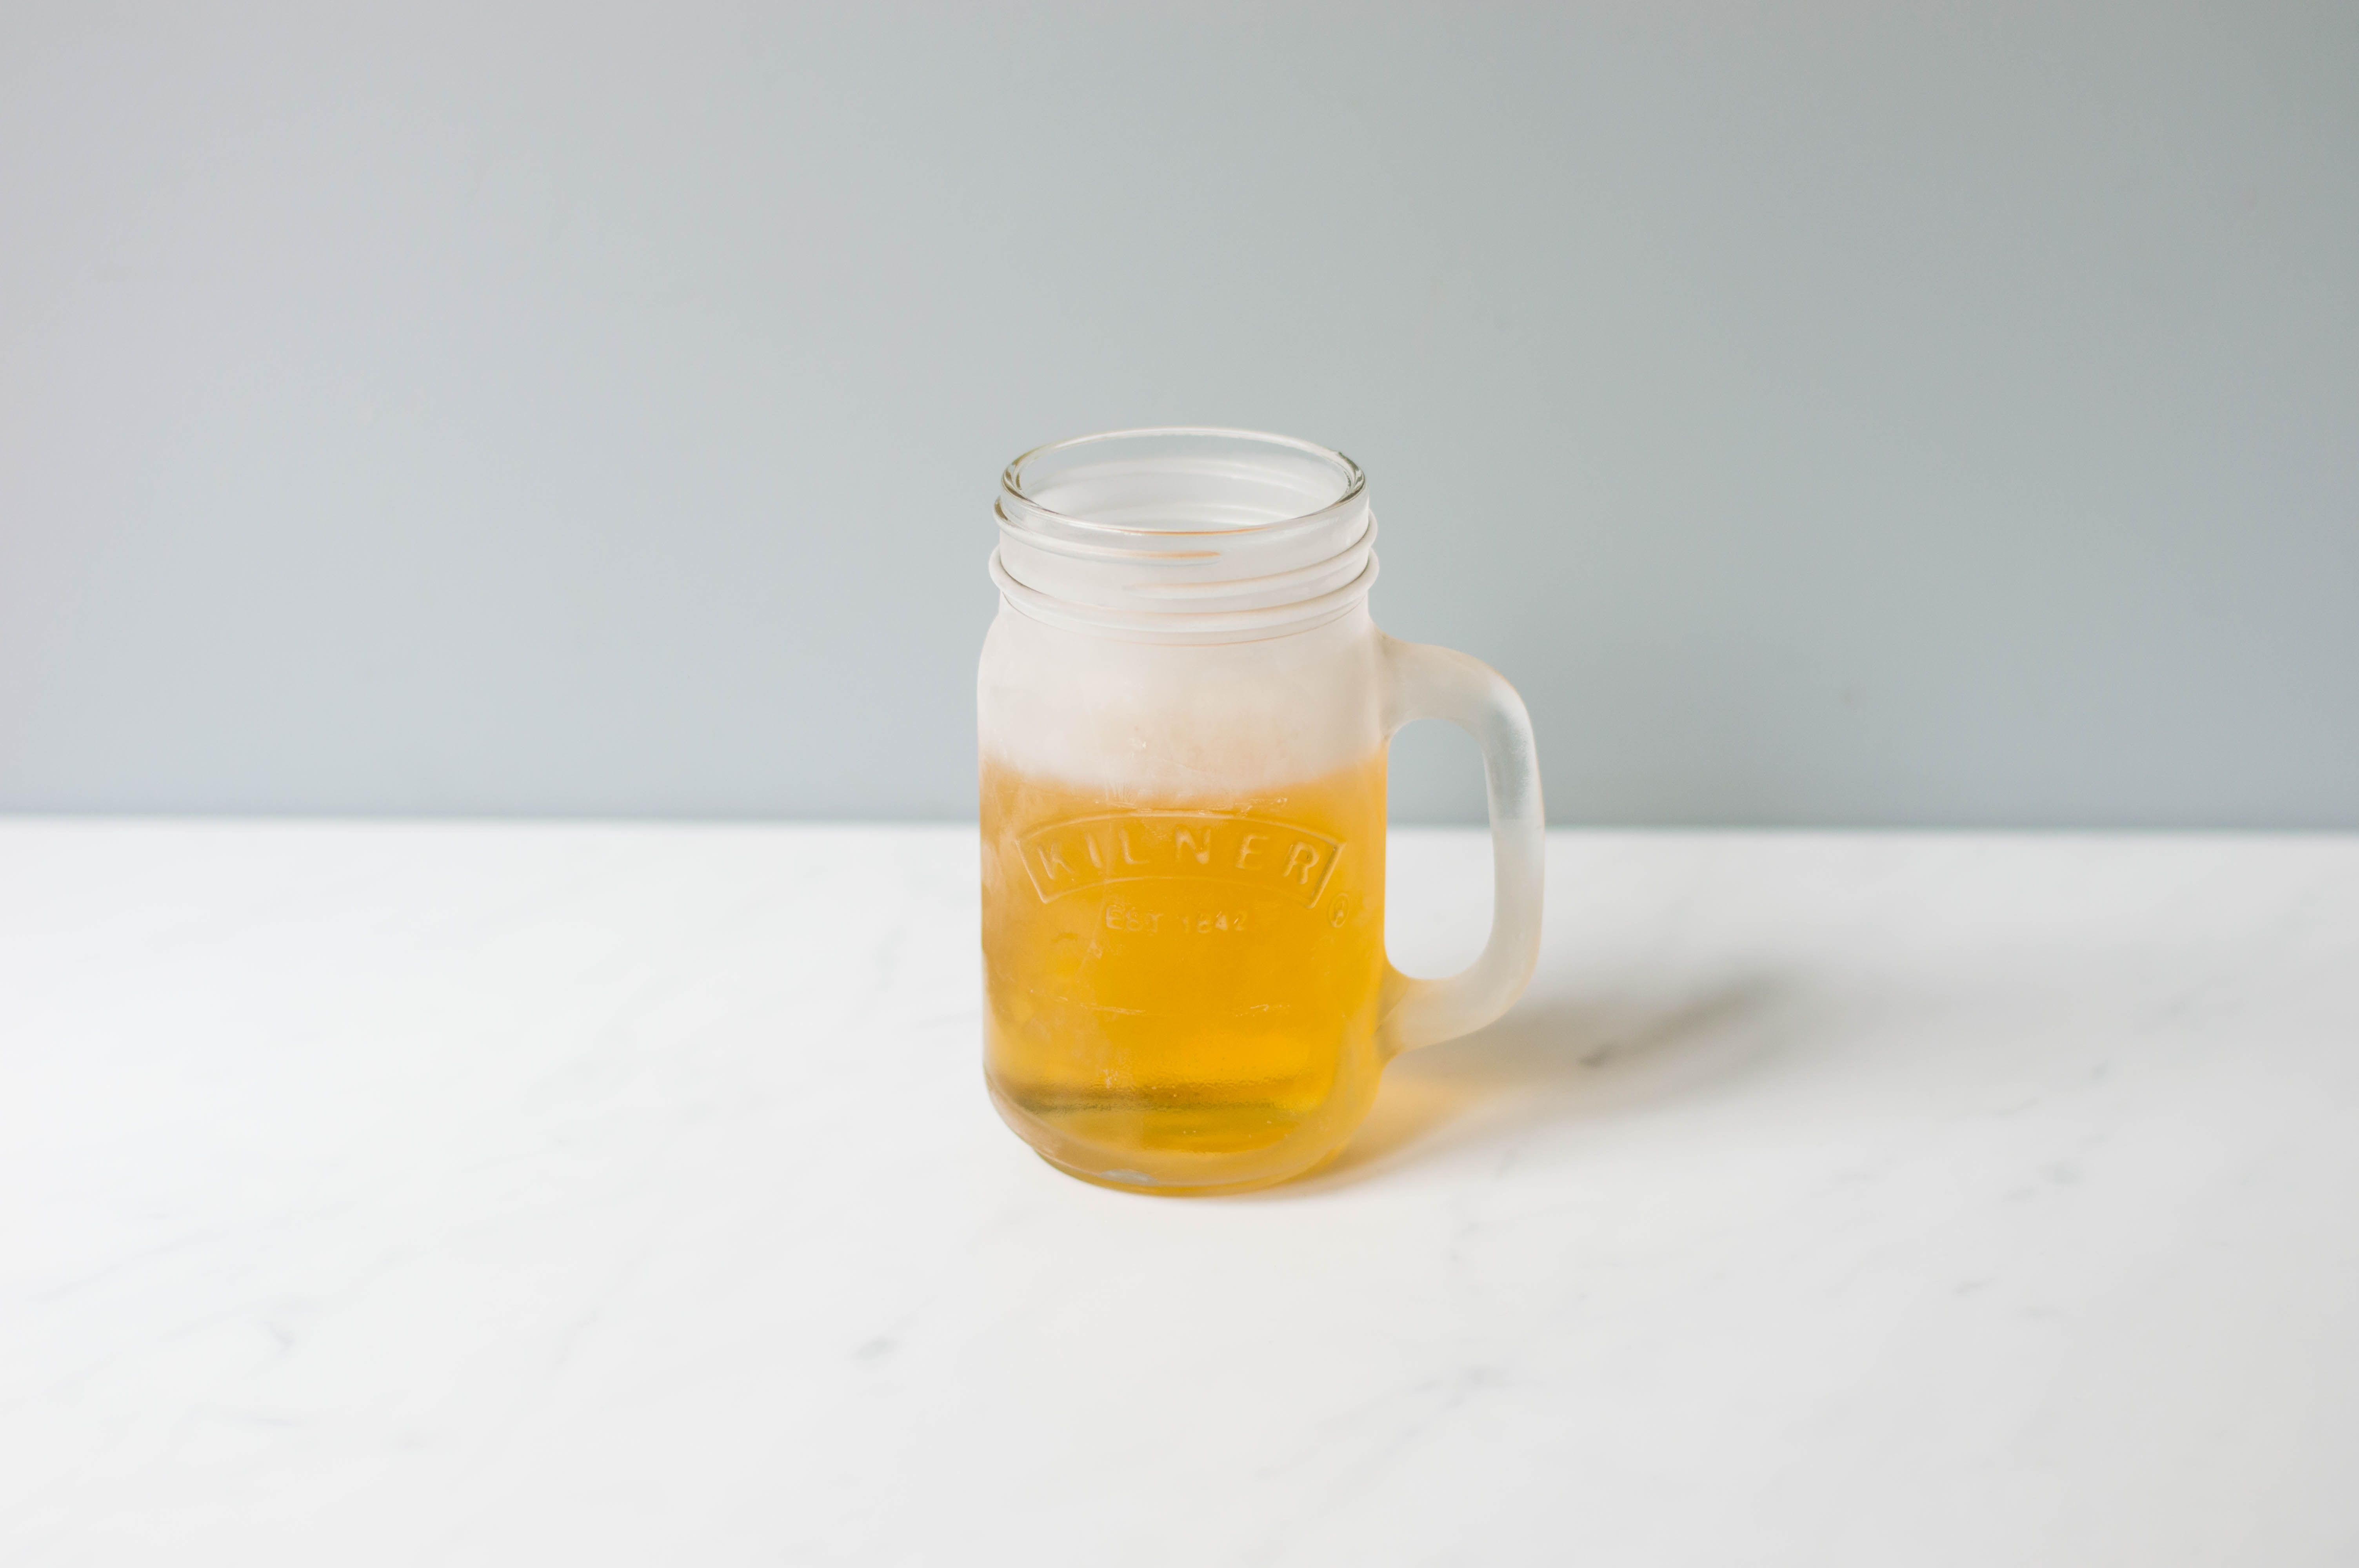 Fill frosty glass 2/3 with cream soda